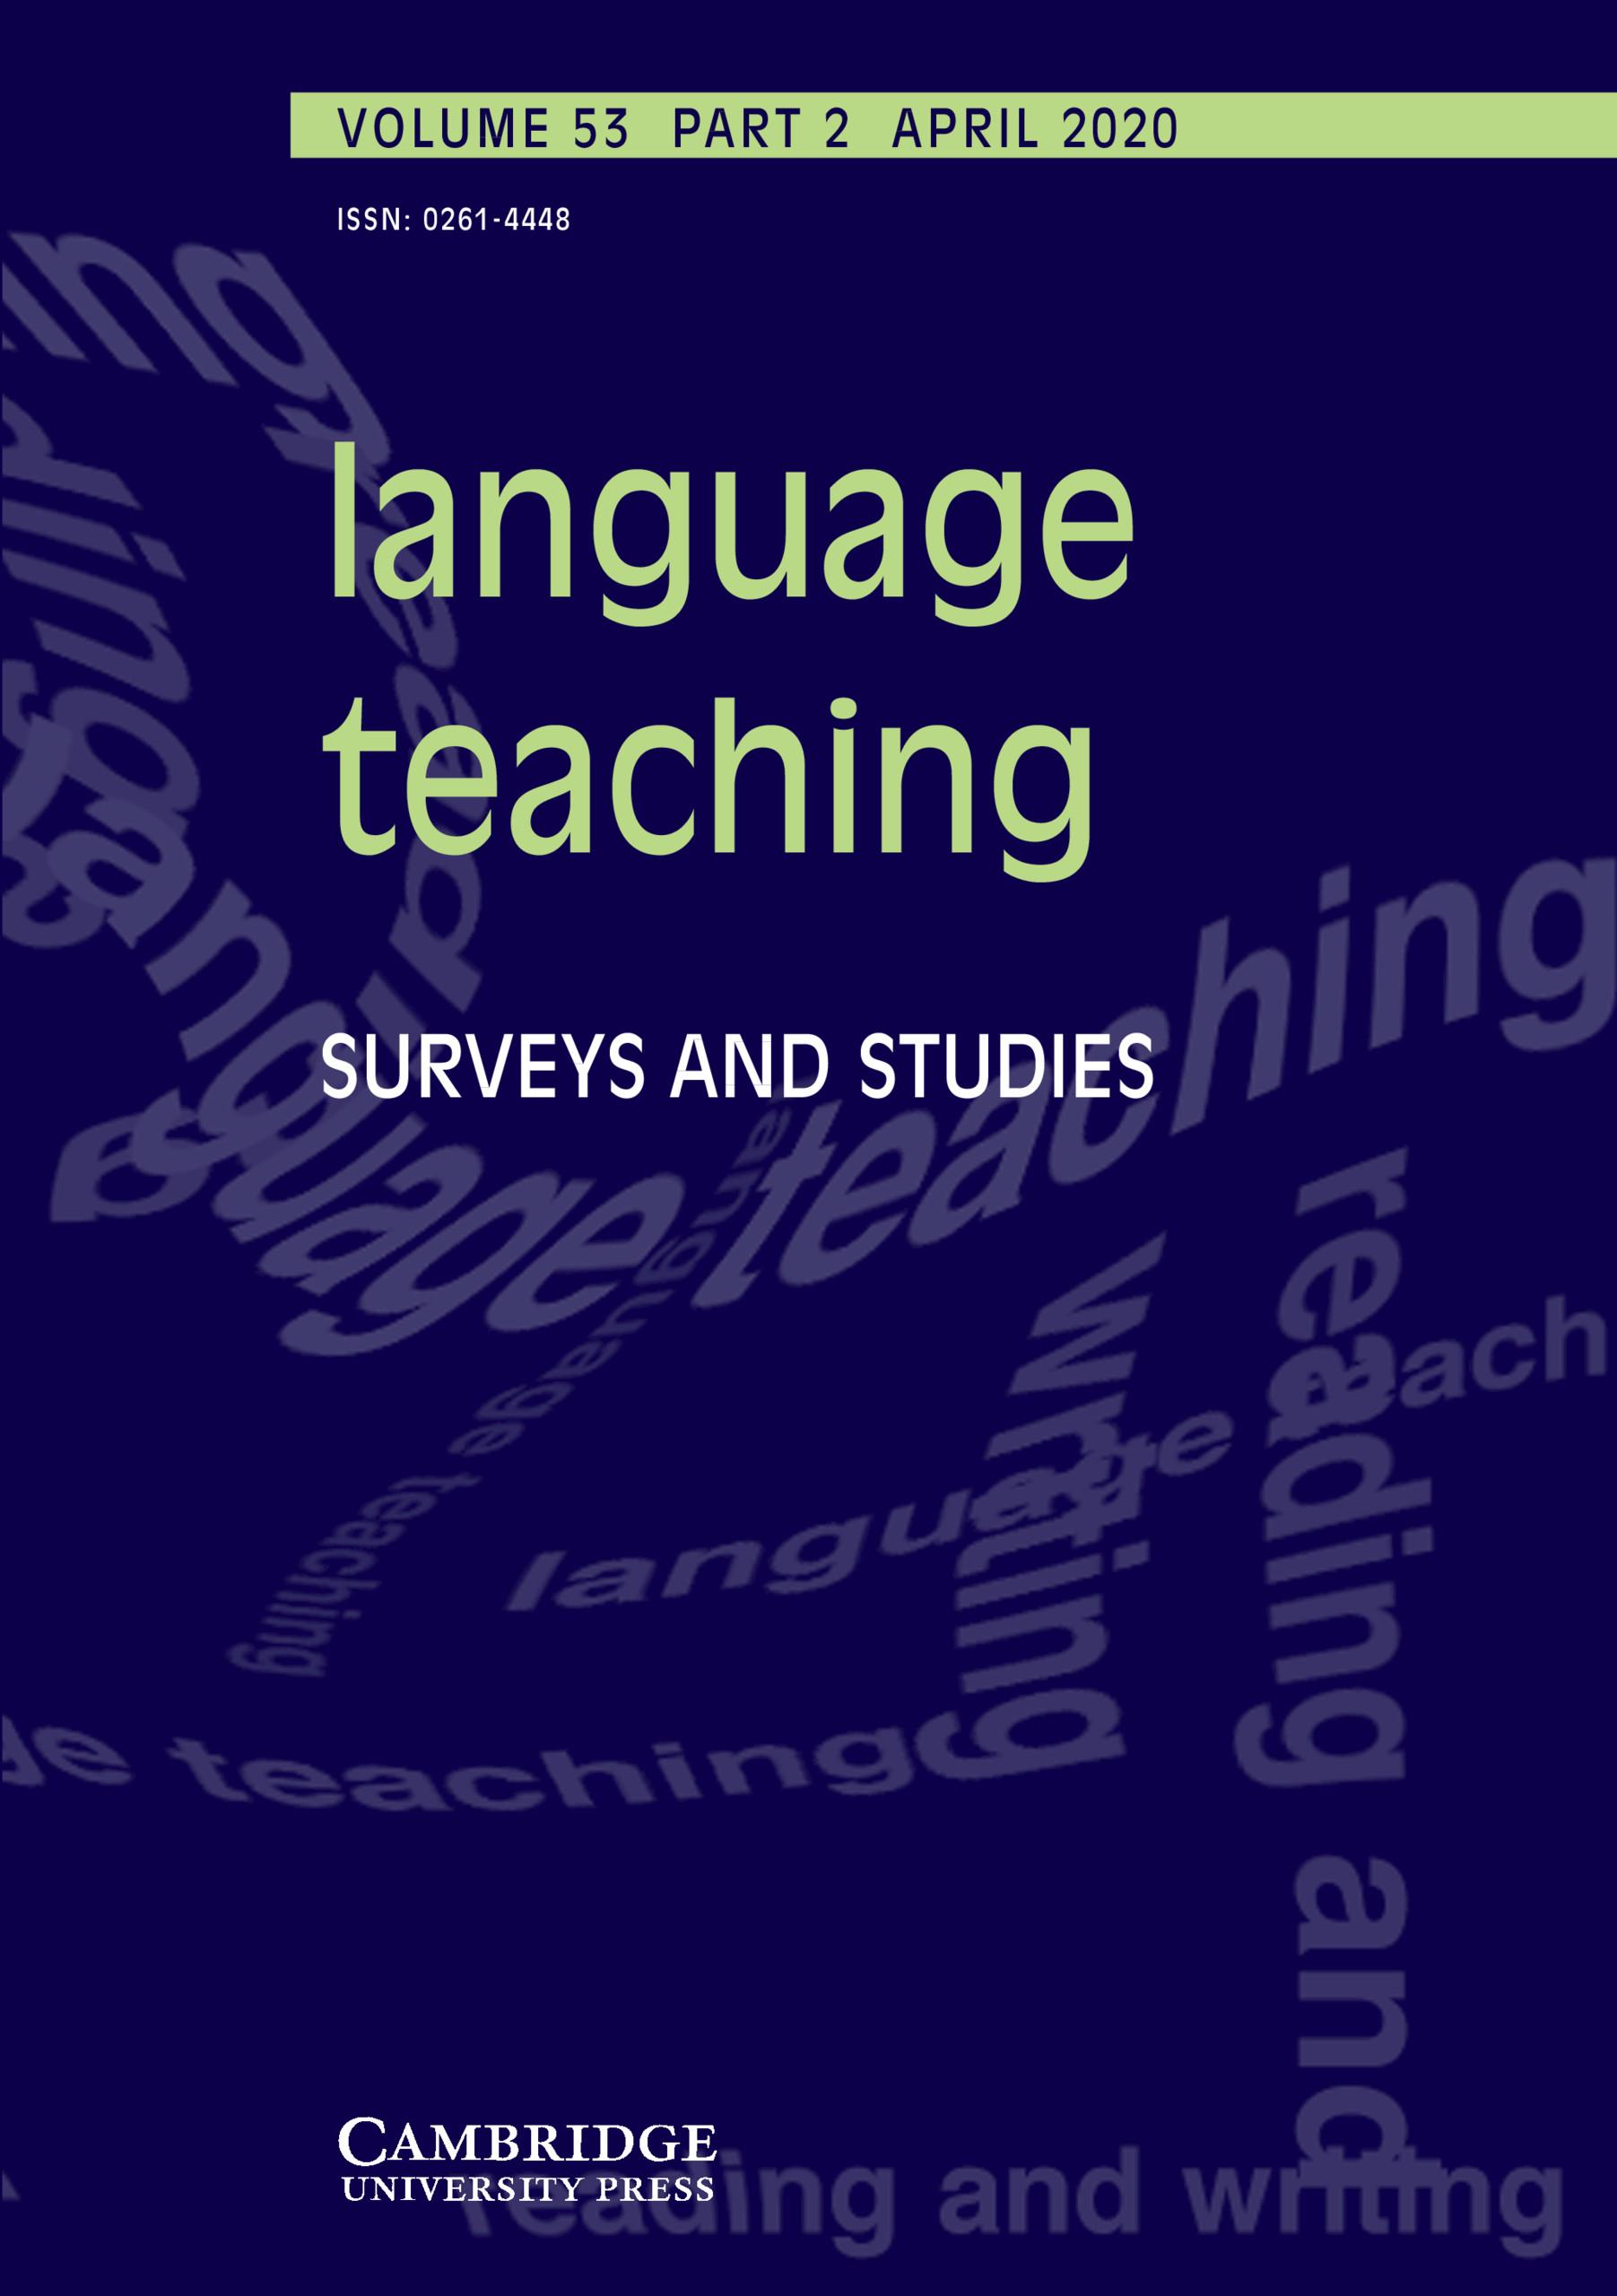 Language Teaching (SSCI)